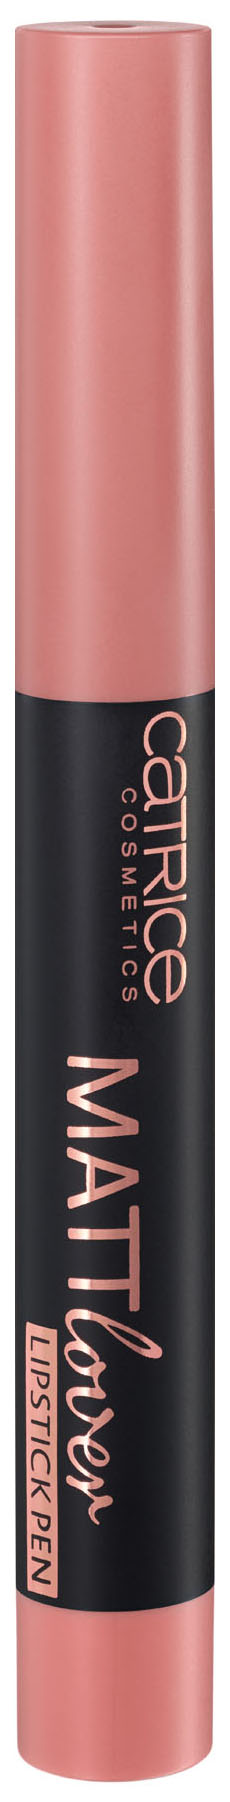 Помада CATRICE Mattlover Lipstick Pen 40 Нюдовый